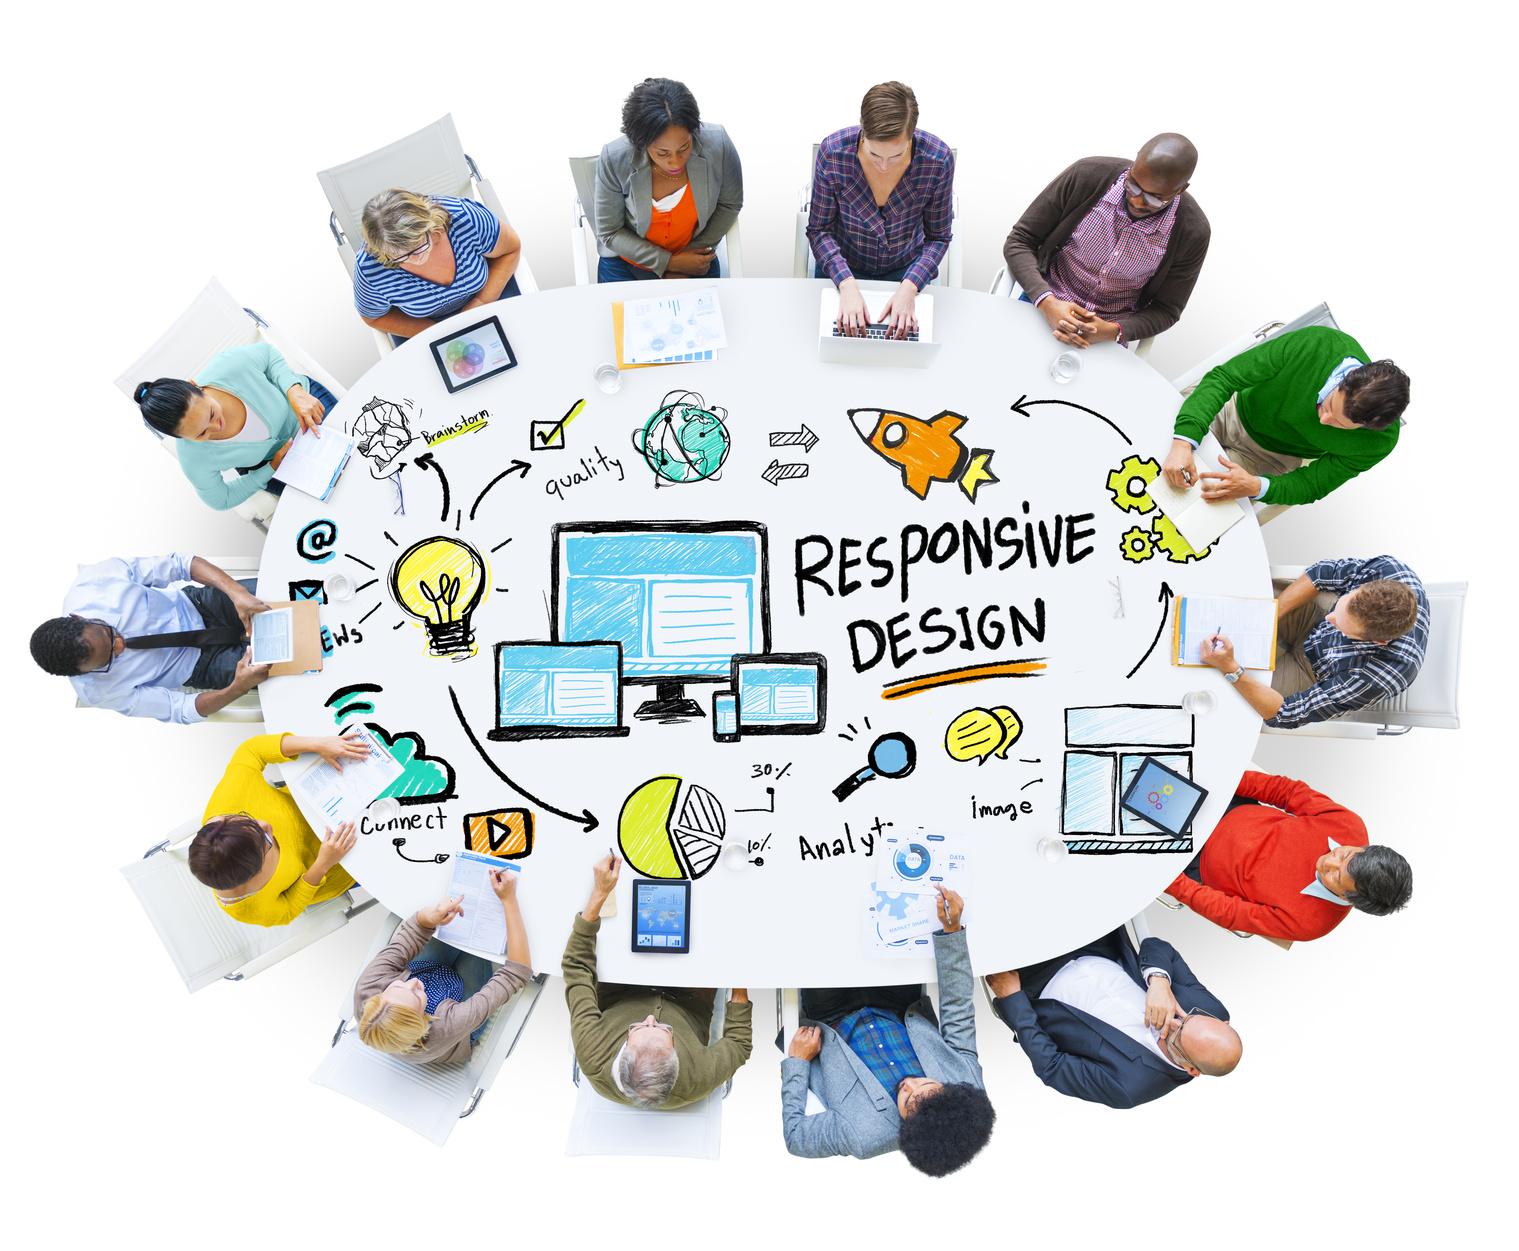 Responsive Design Internet